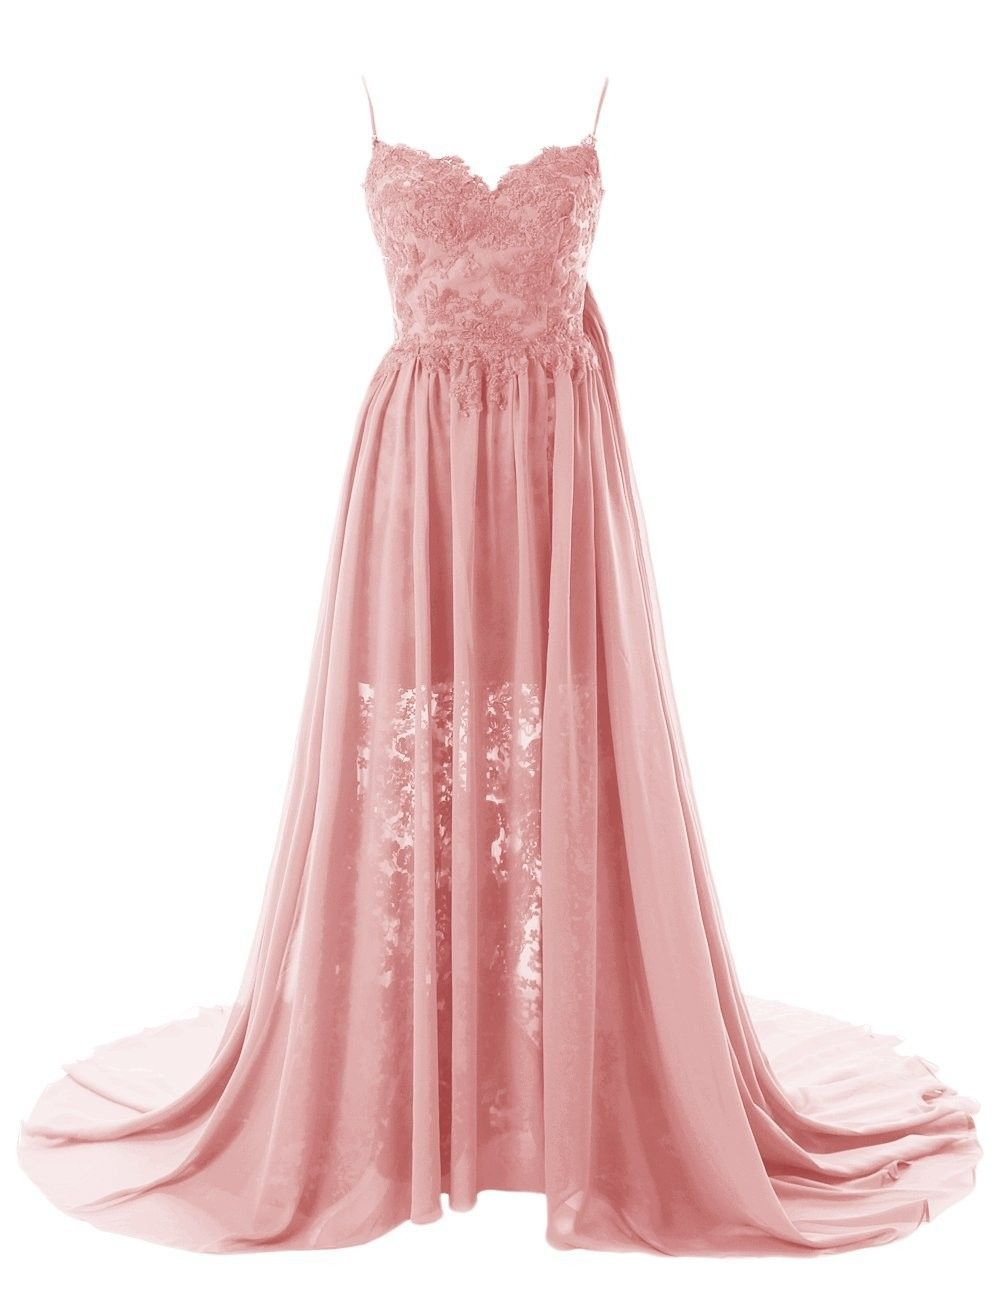 Simple aline sweetheart spaghetti straps chiffon long prom dress